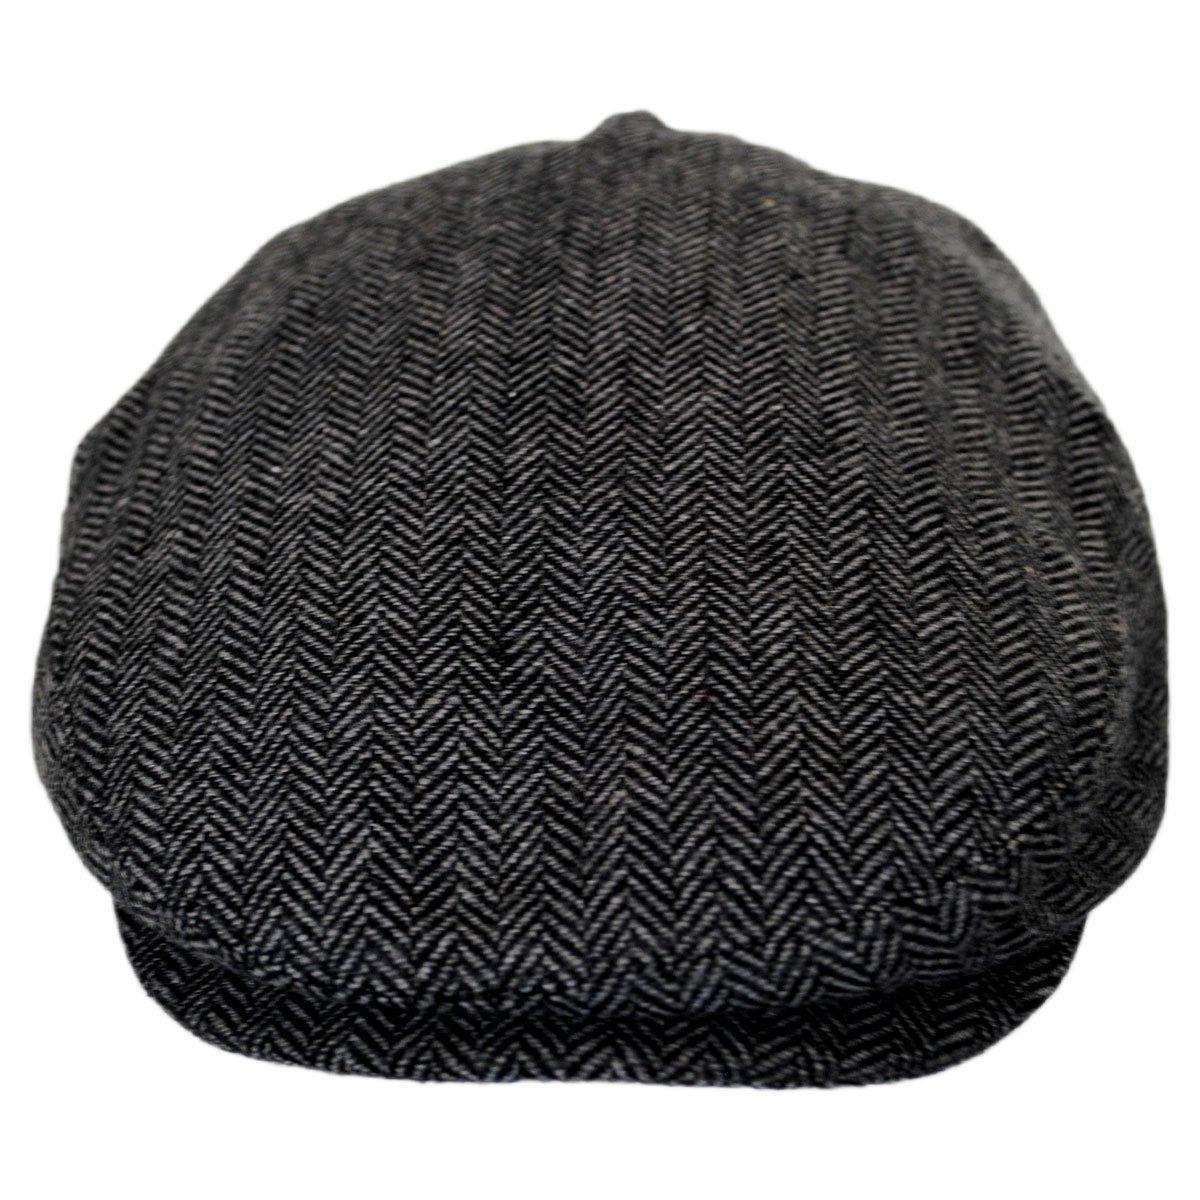 Baskerville Hat Company Dartmoor Herringbone Wool Ivy Cap - Gray Black at  Amazon Men s Clothing store  183c15d25d45